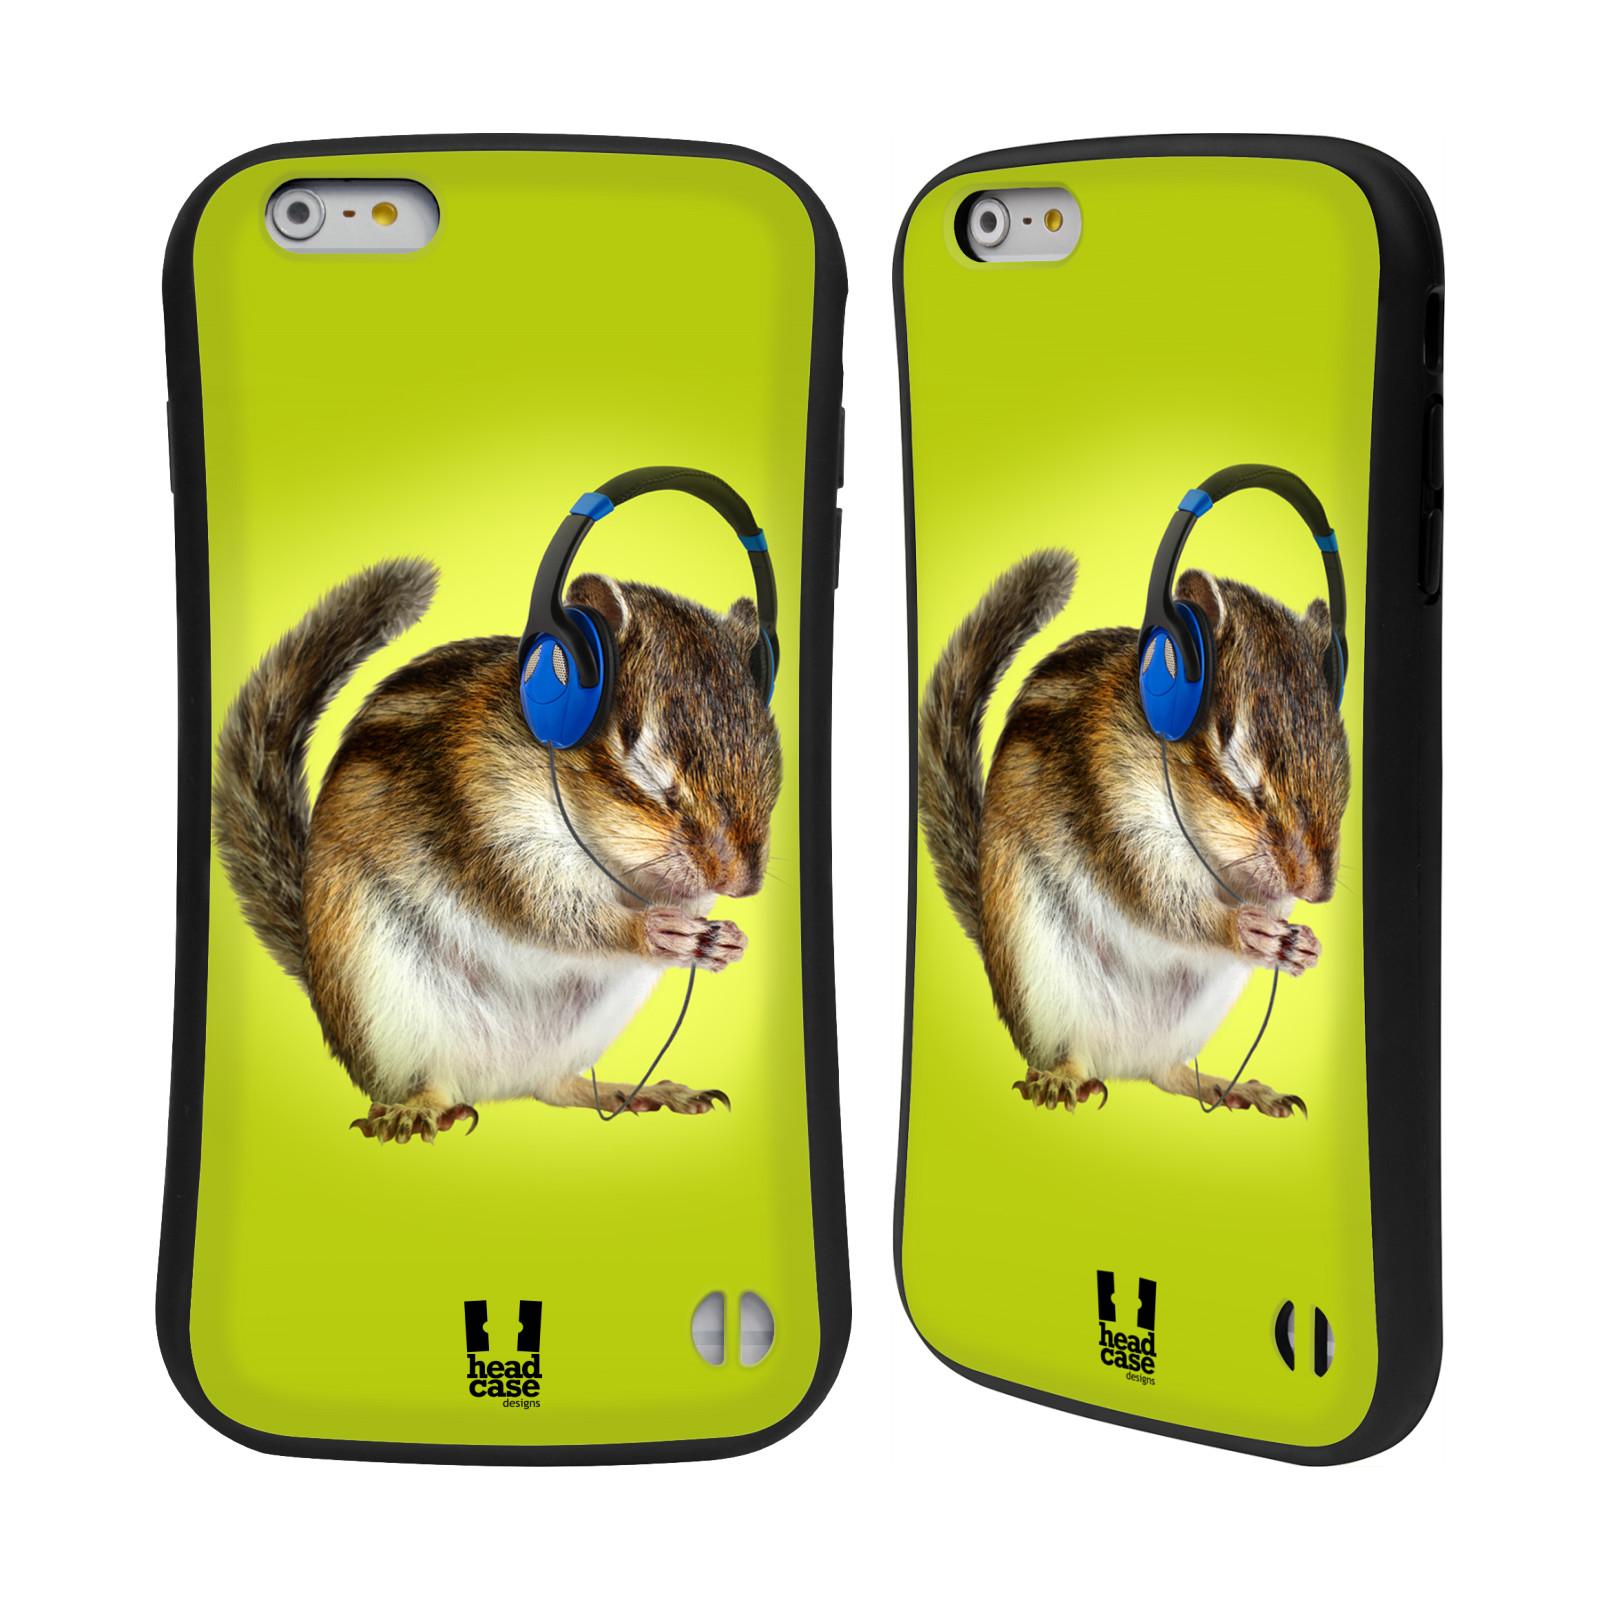 HEAD CASE silikon/plast odolný obal na mobil Apple Iphone 6 PLUS / 6S PLUS vzor Legrační zvířátka veverka se sluchátky